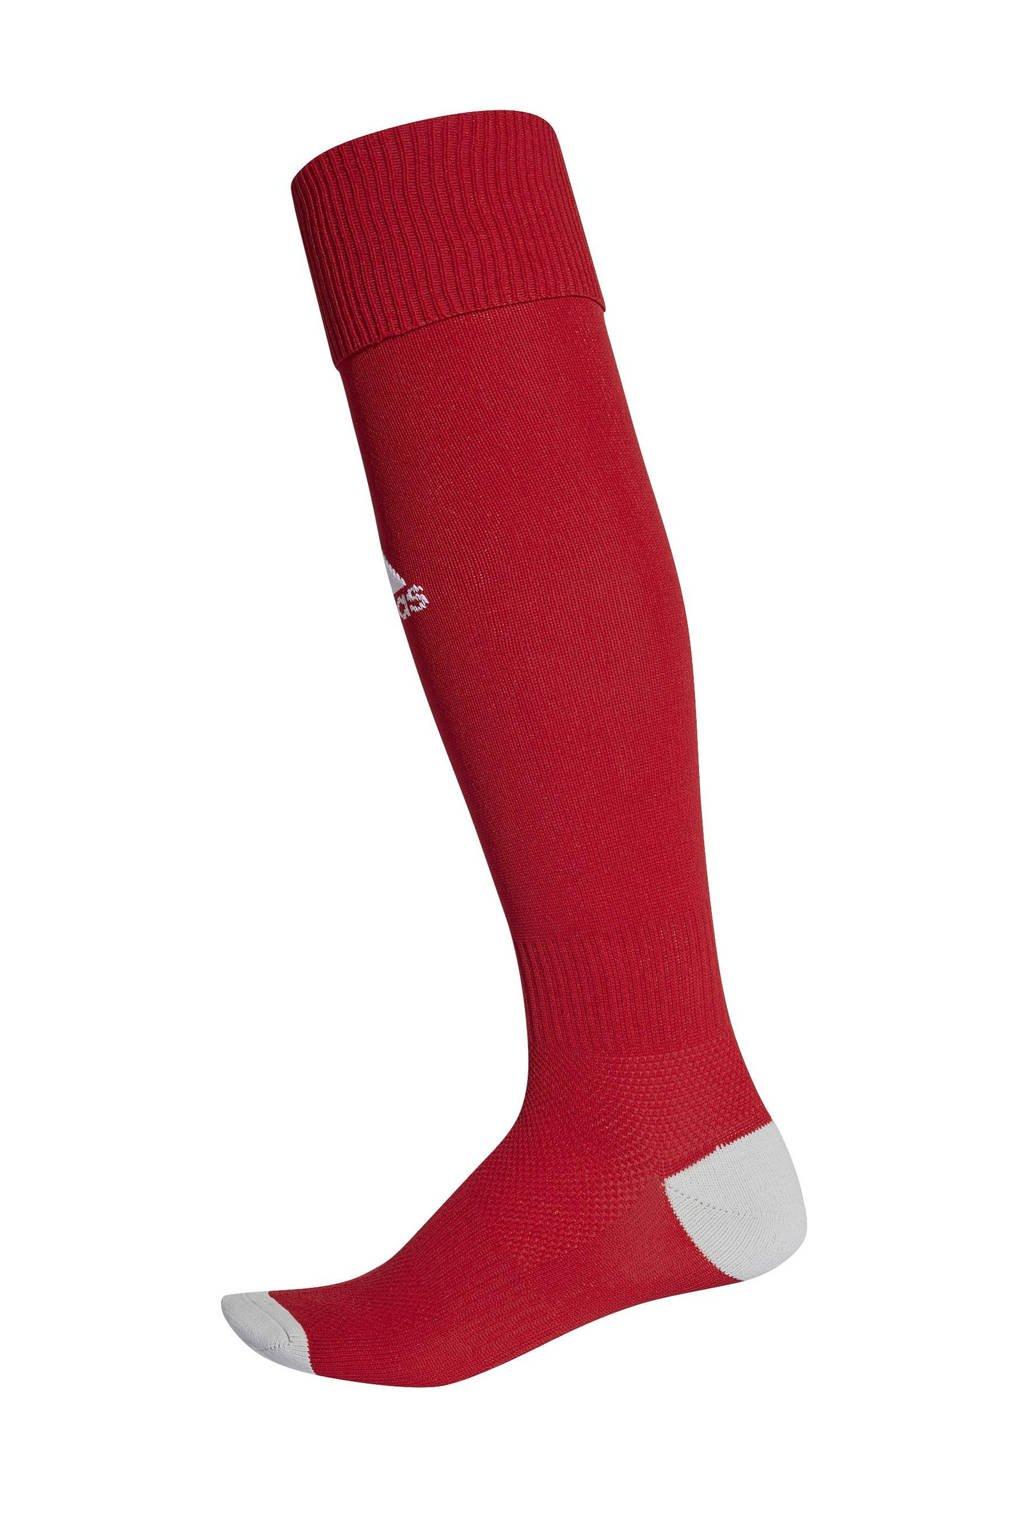 adidas performance Junior  Milano 16 voetbalsokken rood, Rood/lichtgrijs